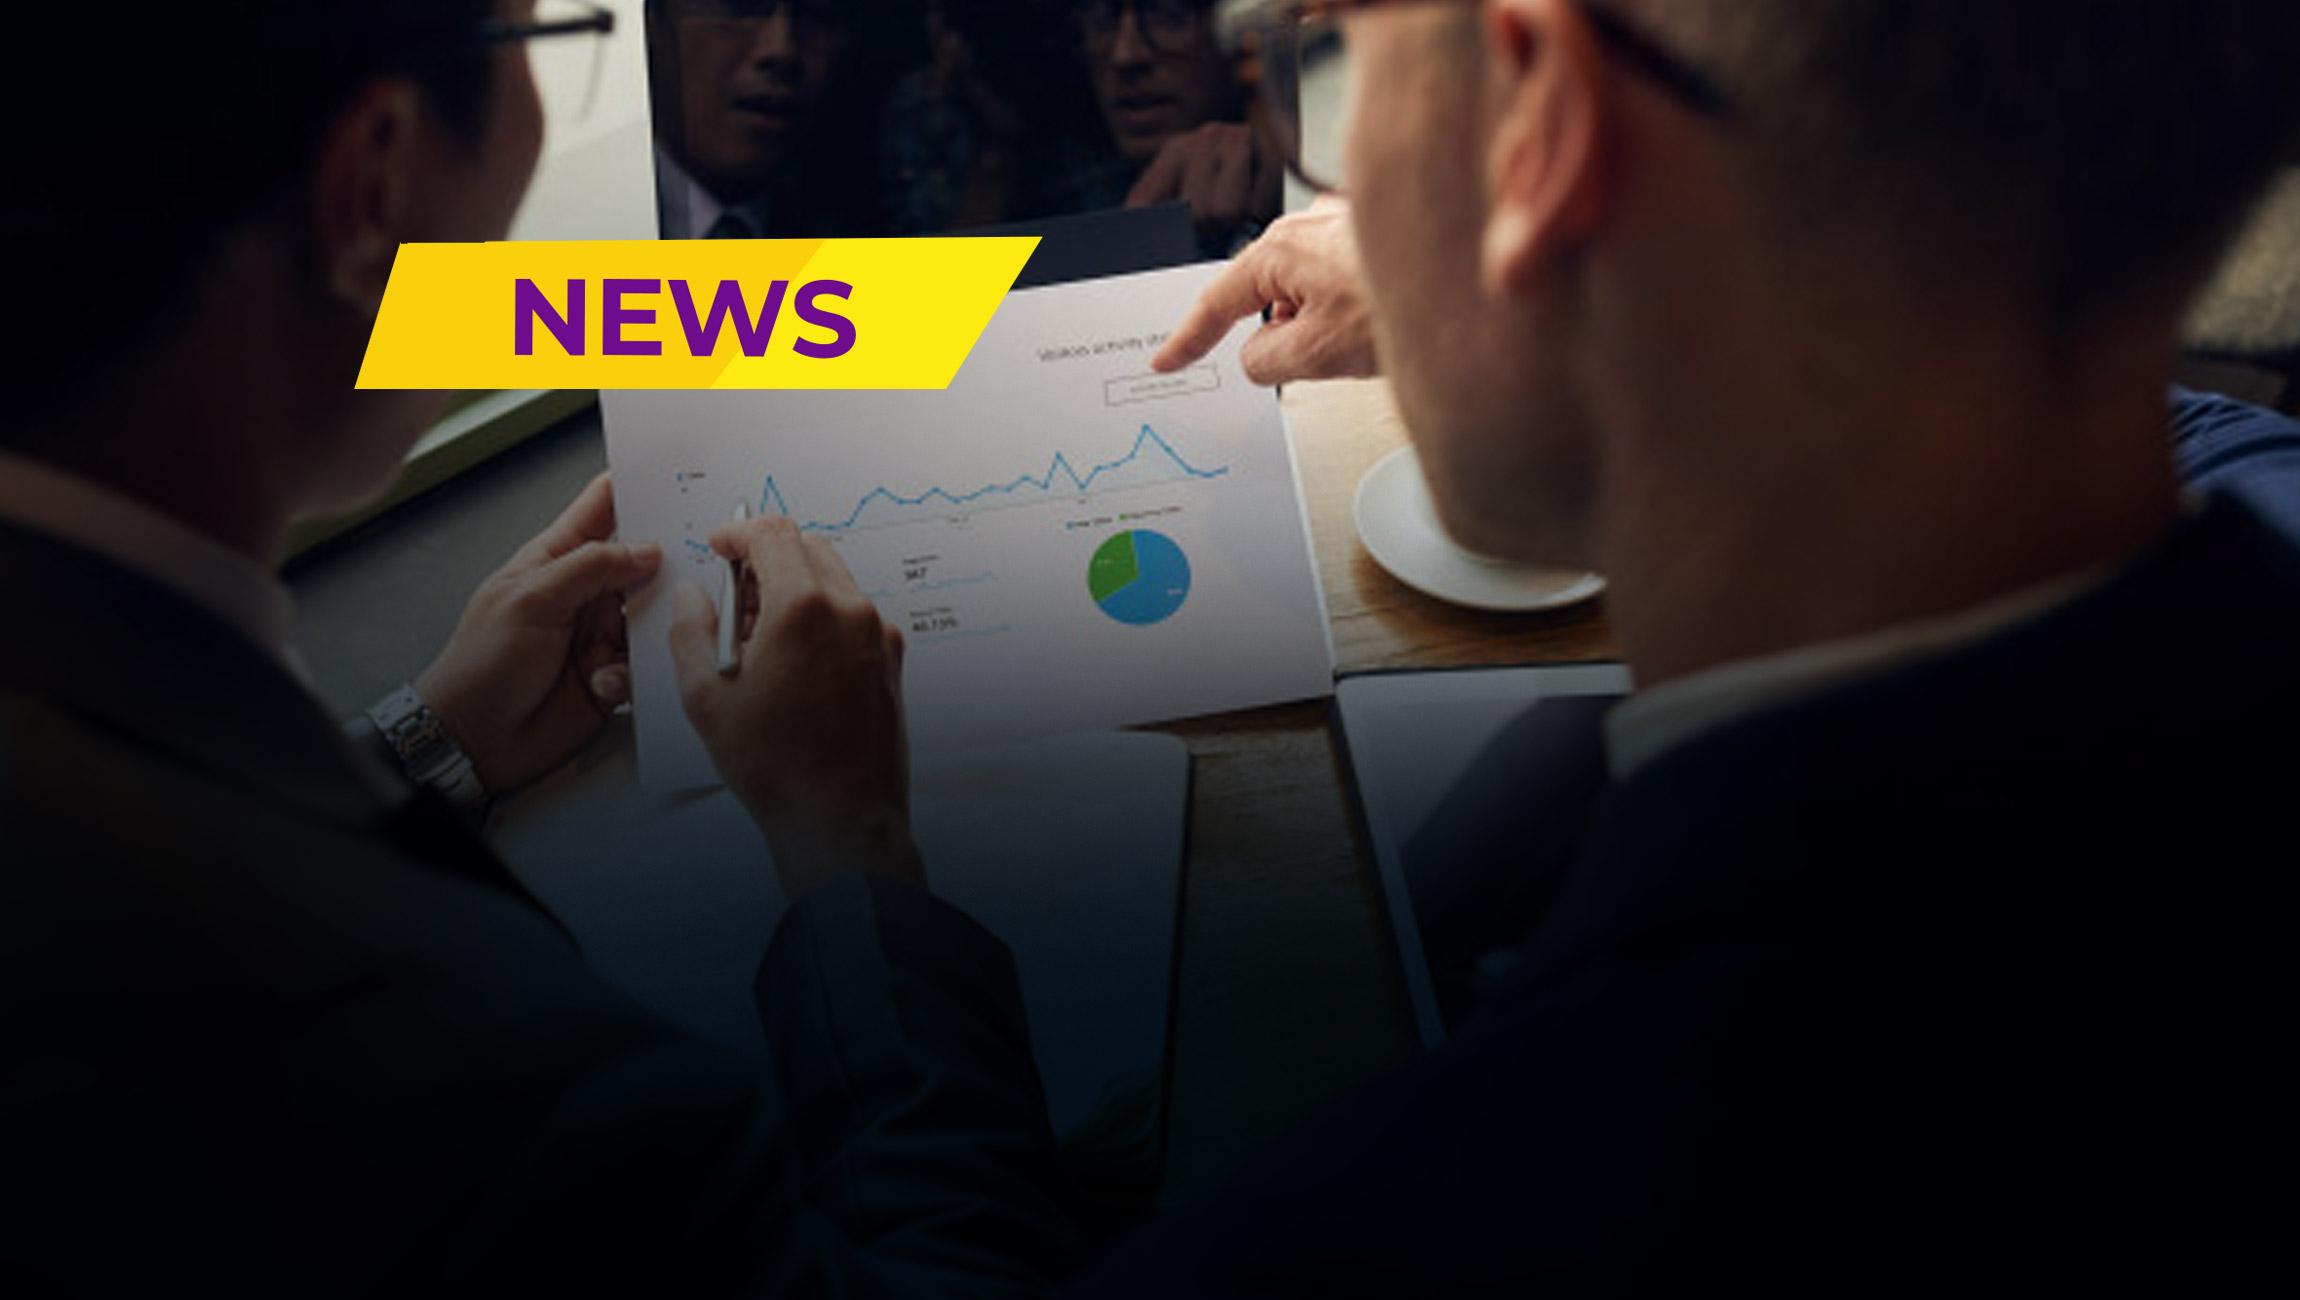 Hitachi Vantara Announces Intent To Acquire Waterline Data